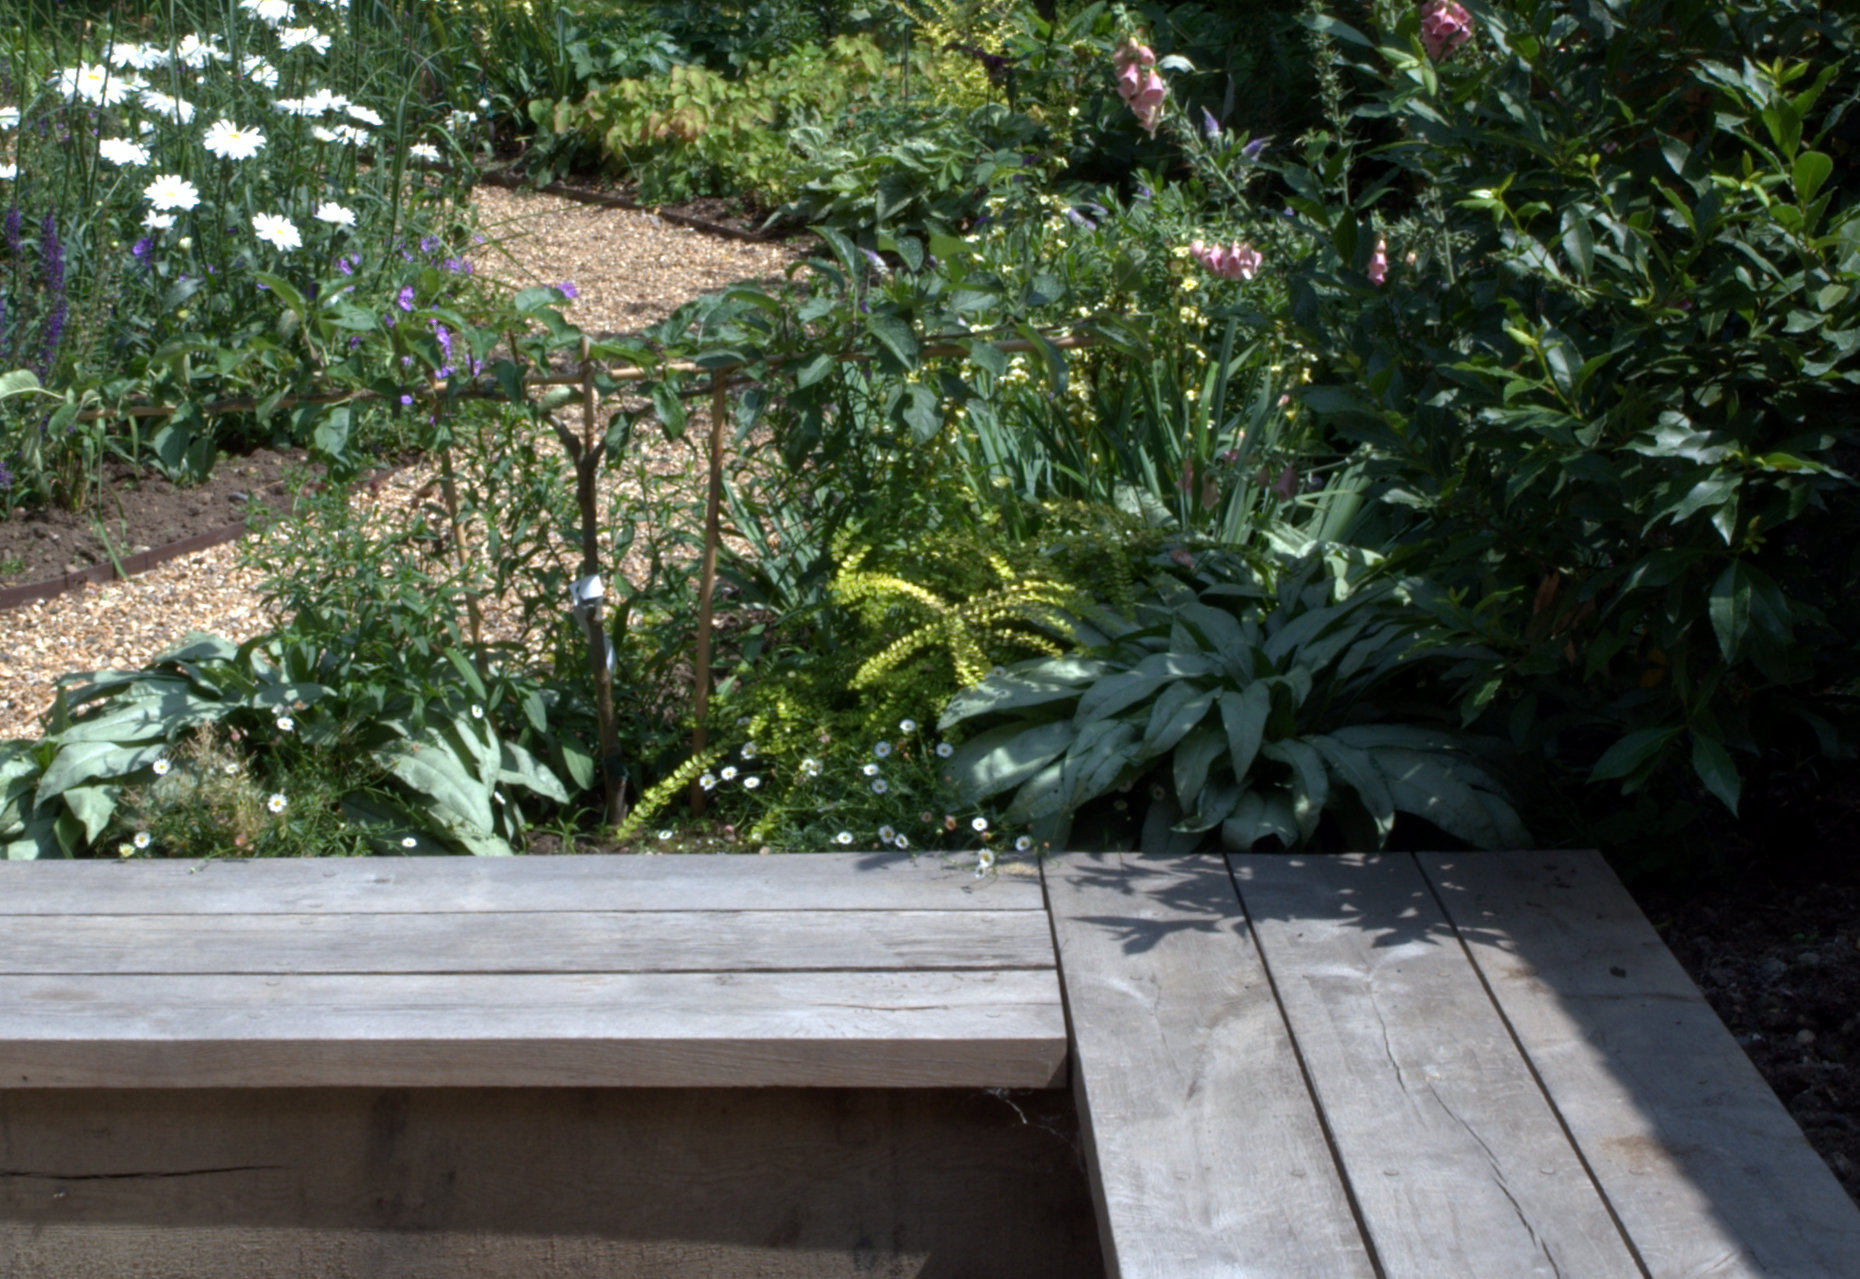 Landscape garden design bedfordshire for Garden design solutions